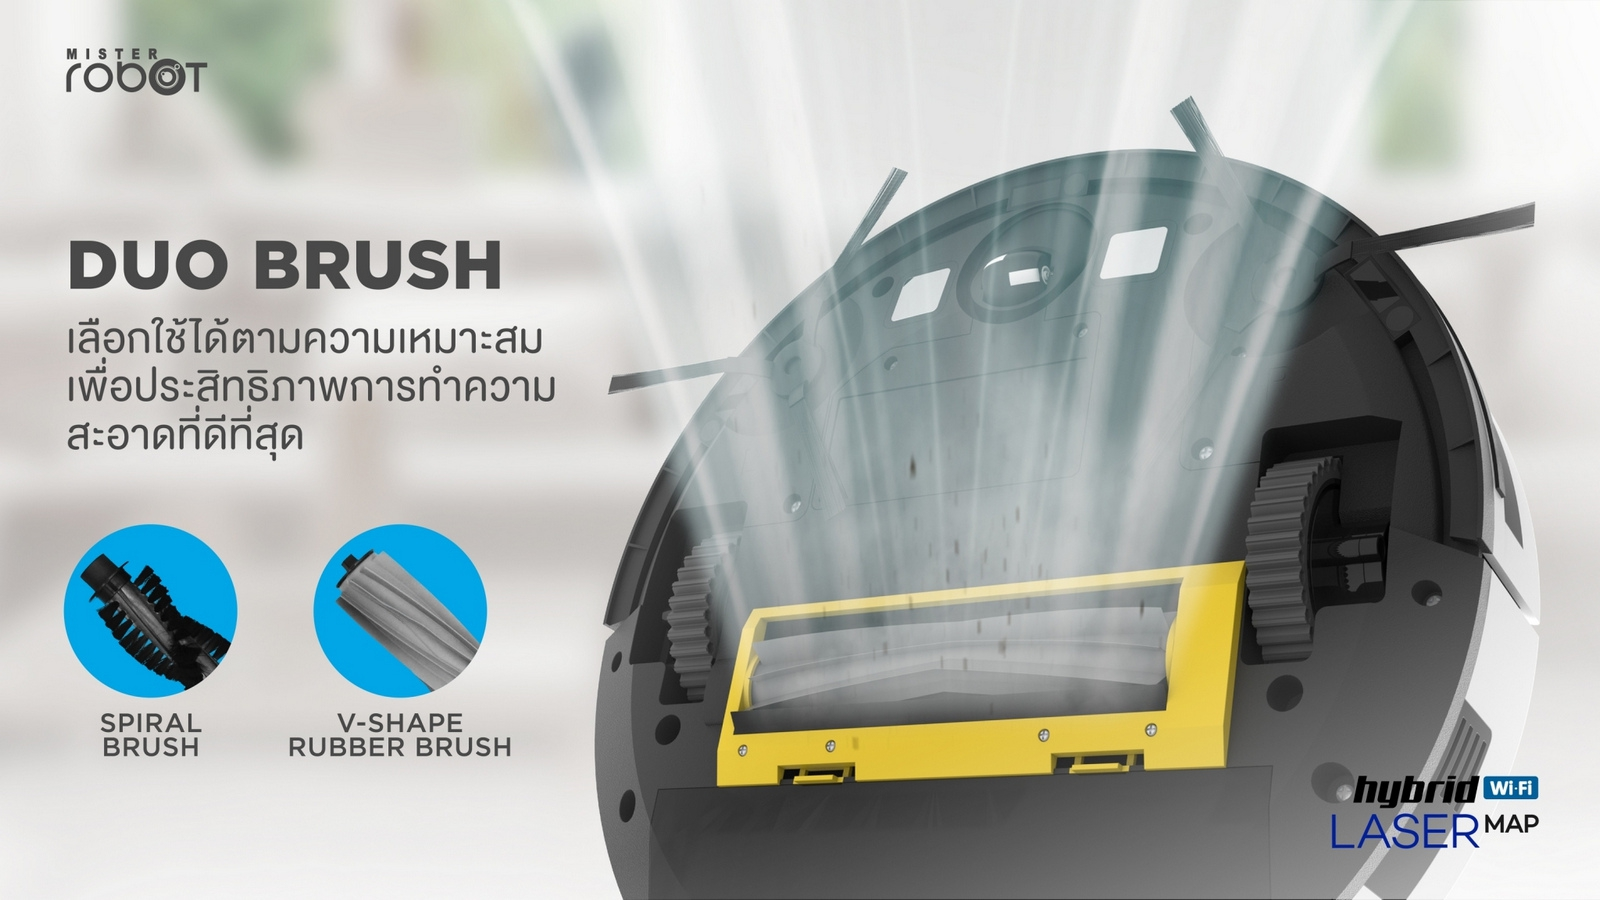 mister-robot-hybrid-laser-map-feature-multipurpose-rotating-brushes